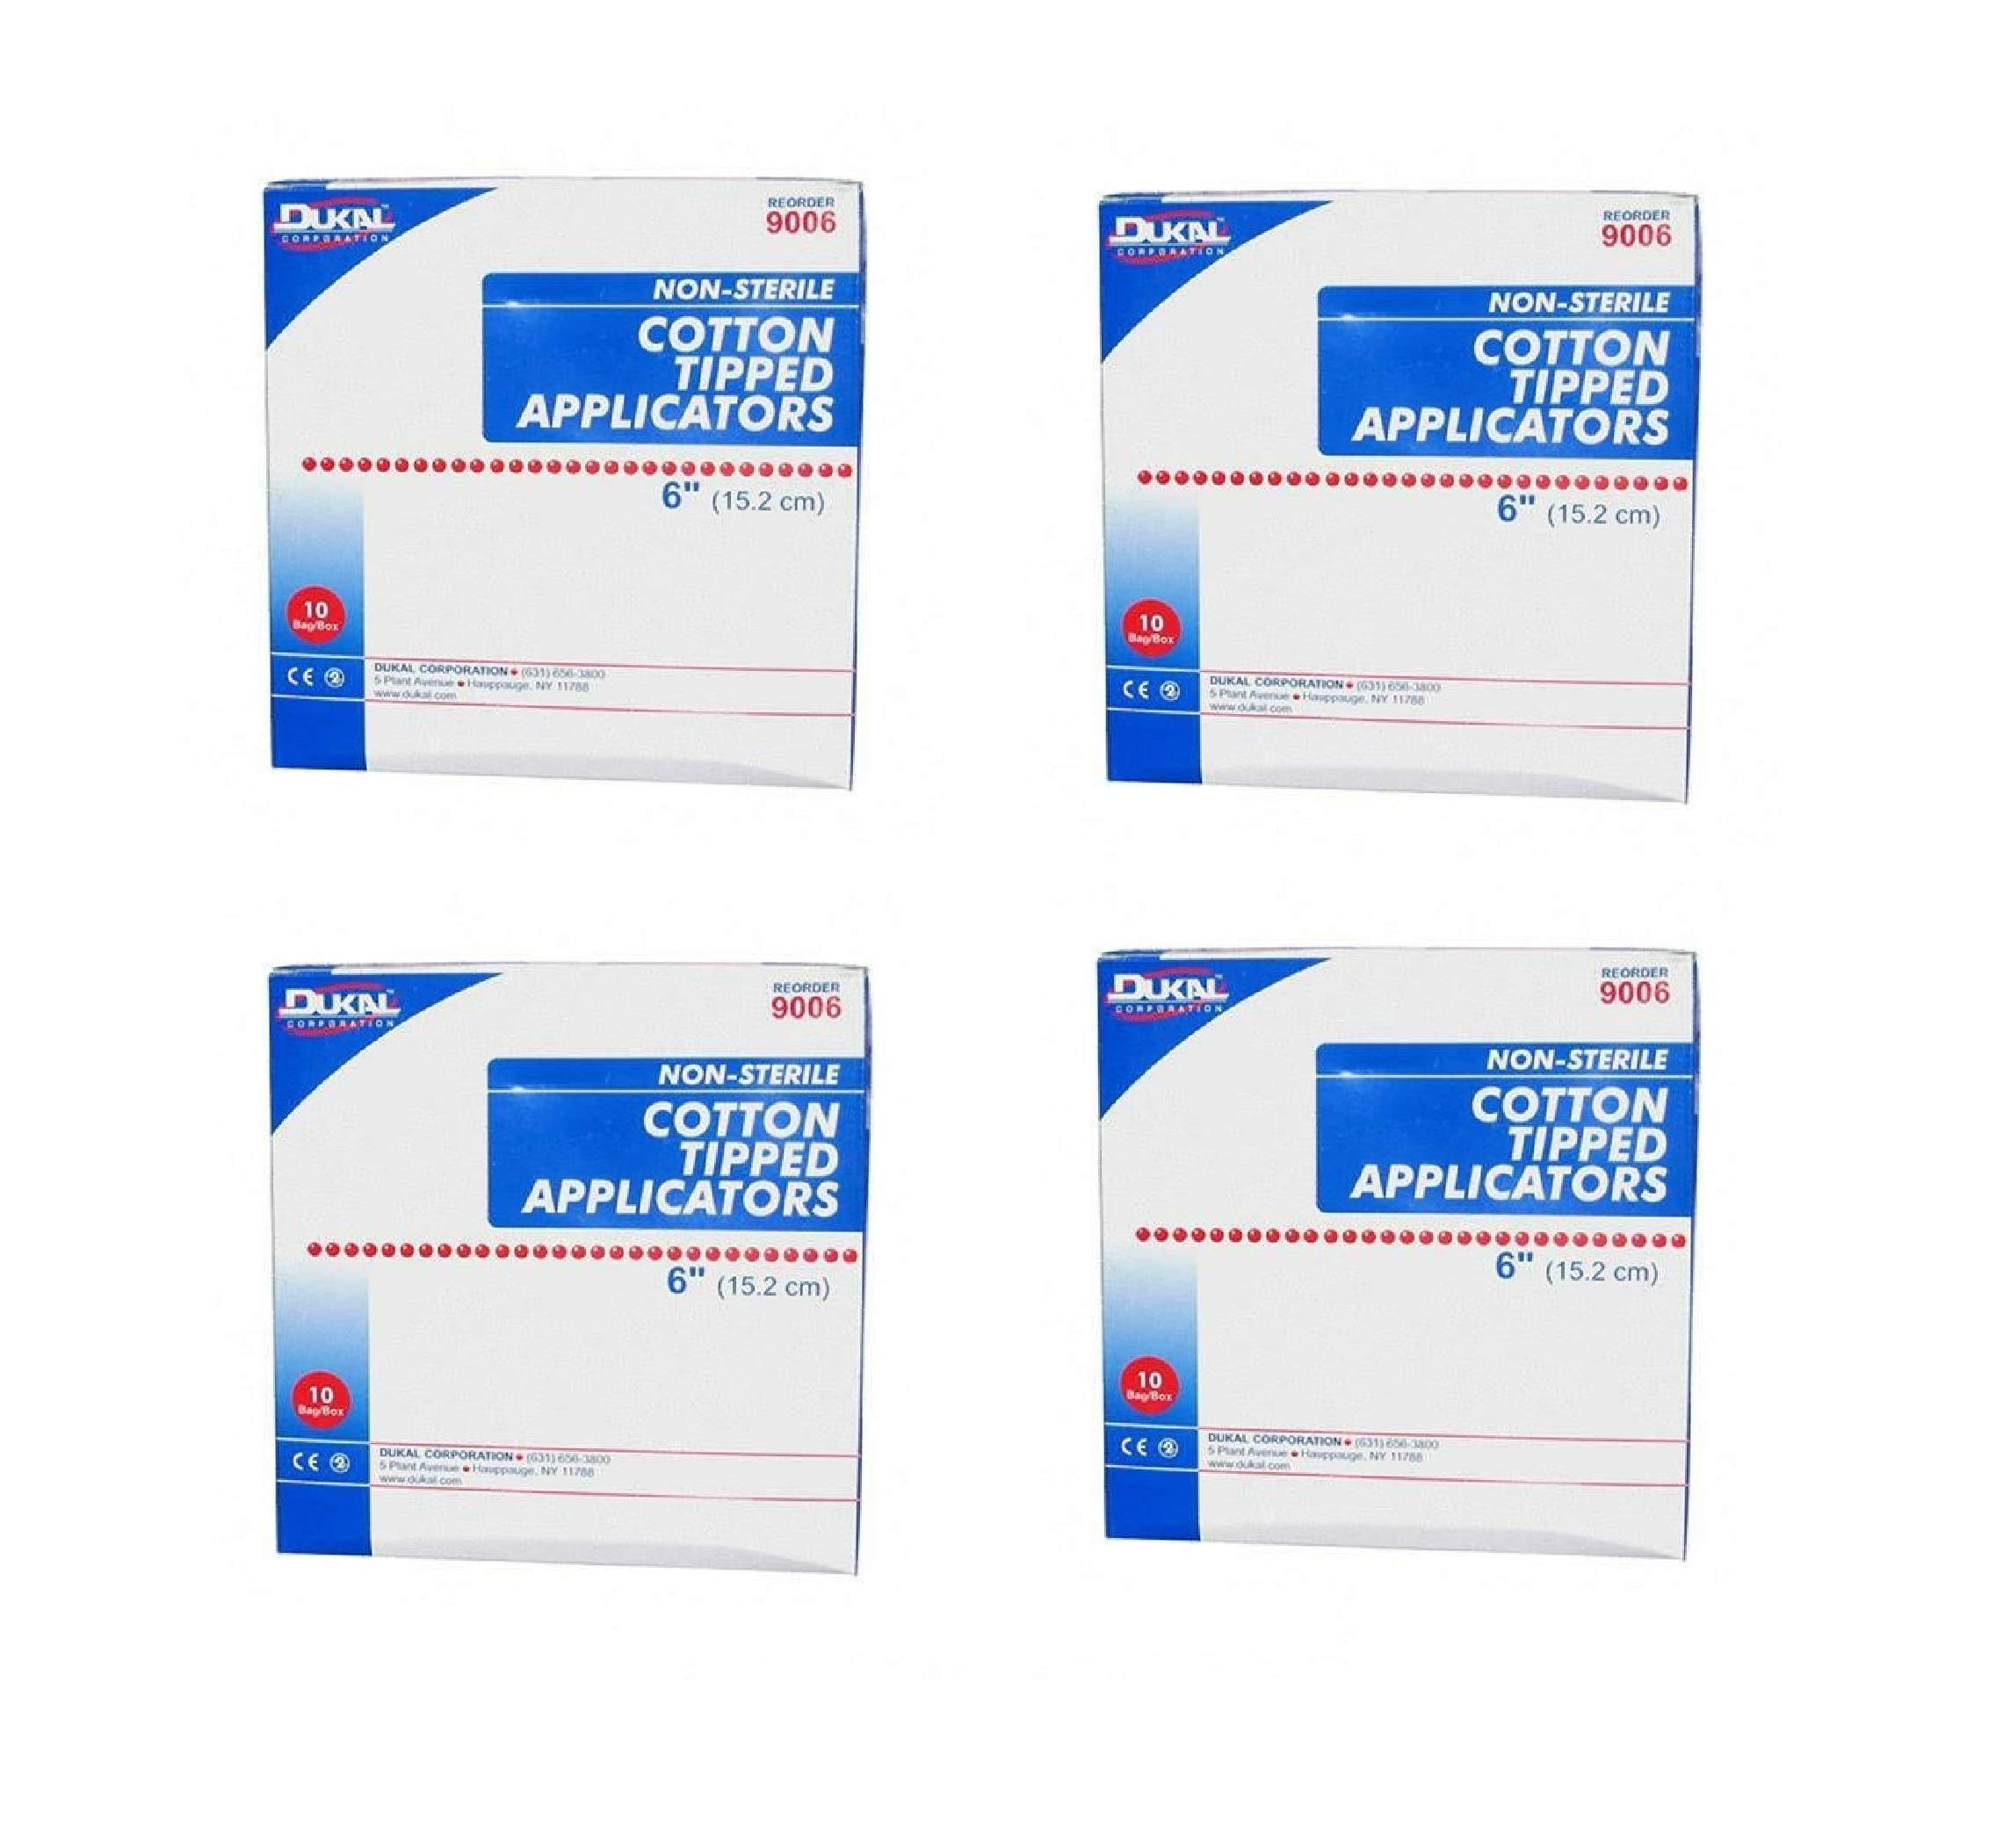 Dukal 9006 Non-Sterile 6'' Cotton Tipped Applicators 10 Bags (DKL9006), 1000 Count/Box (4 Pack) by Dukal (Image #1)